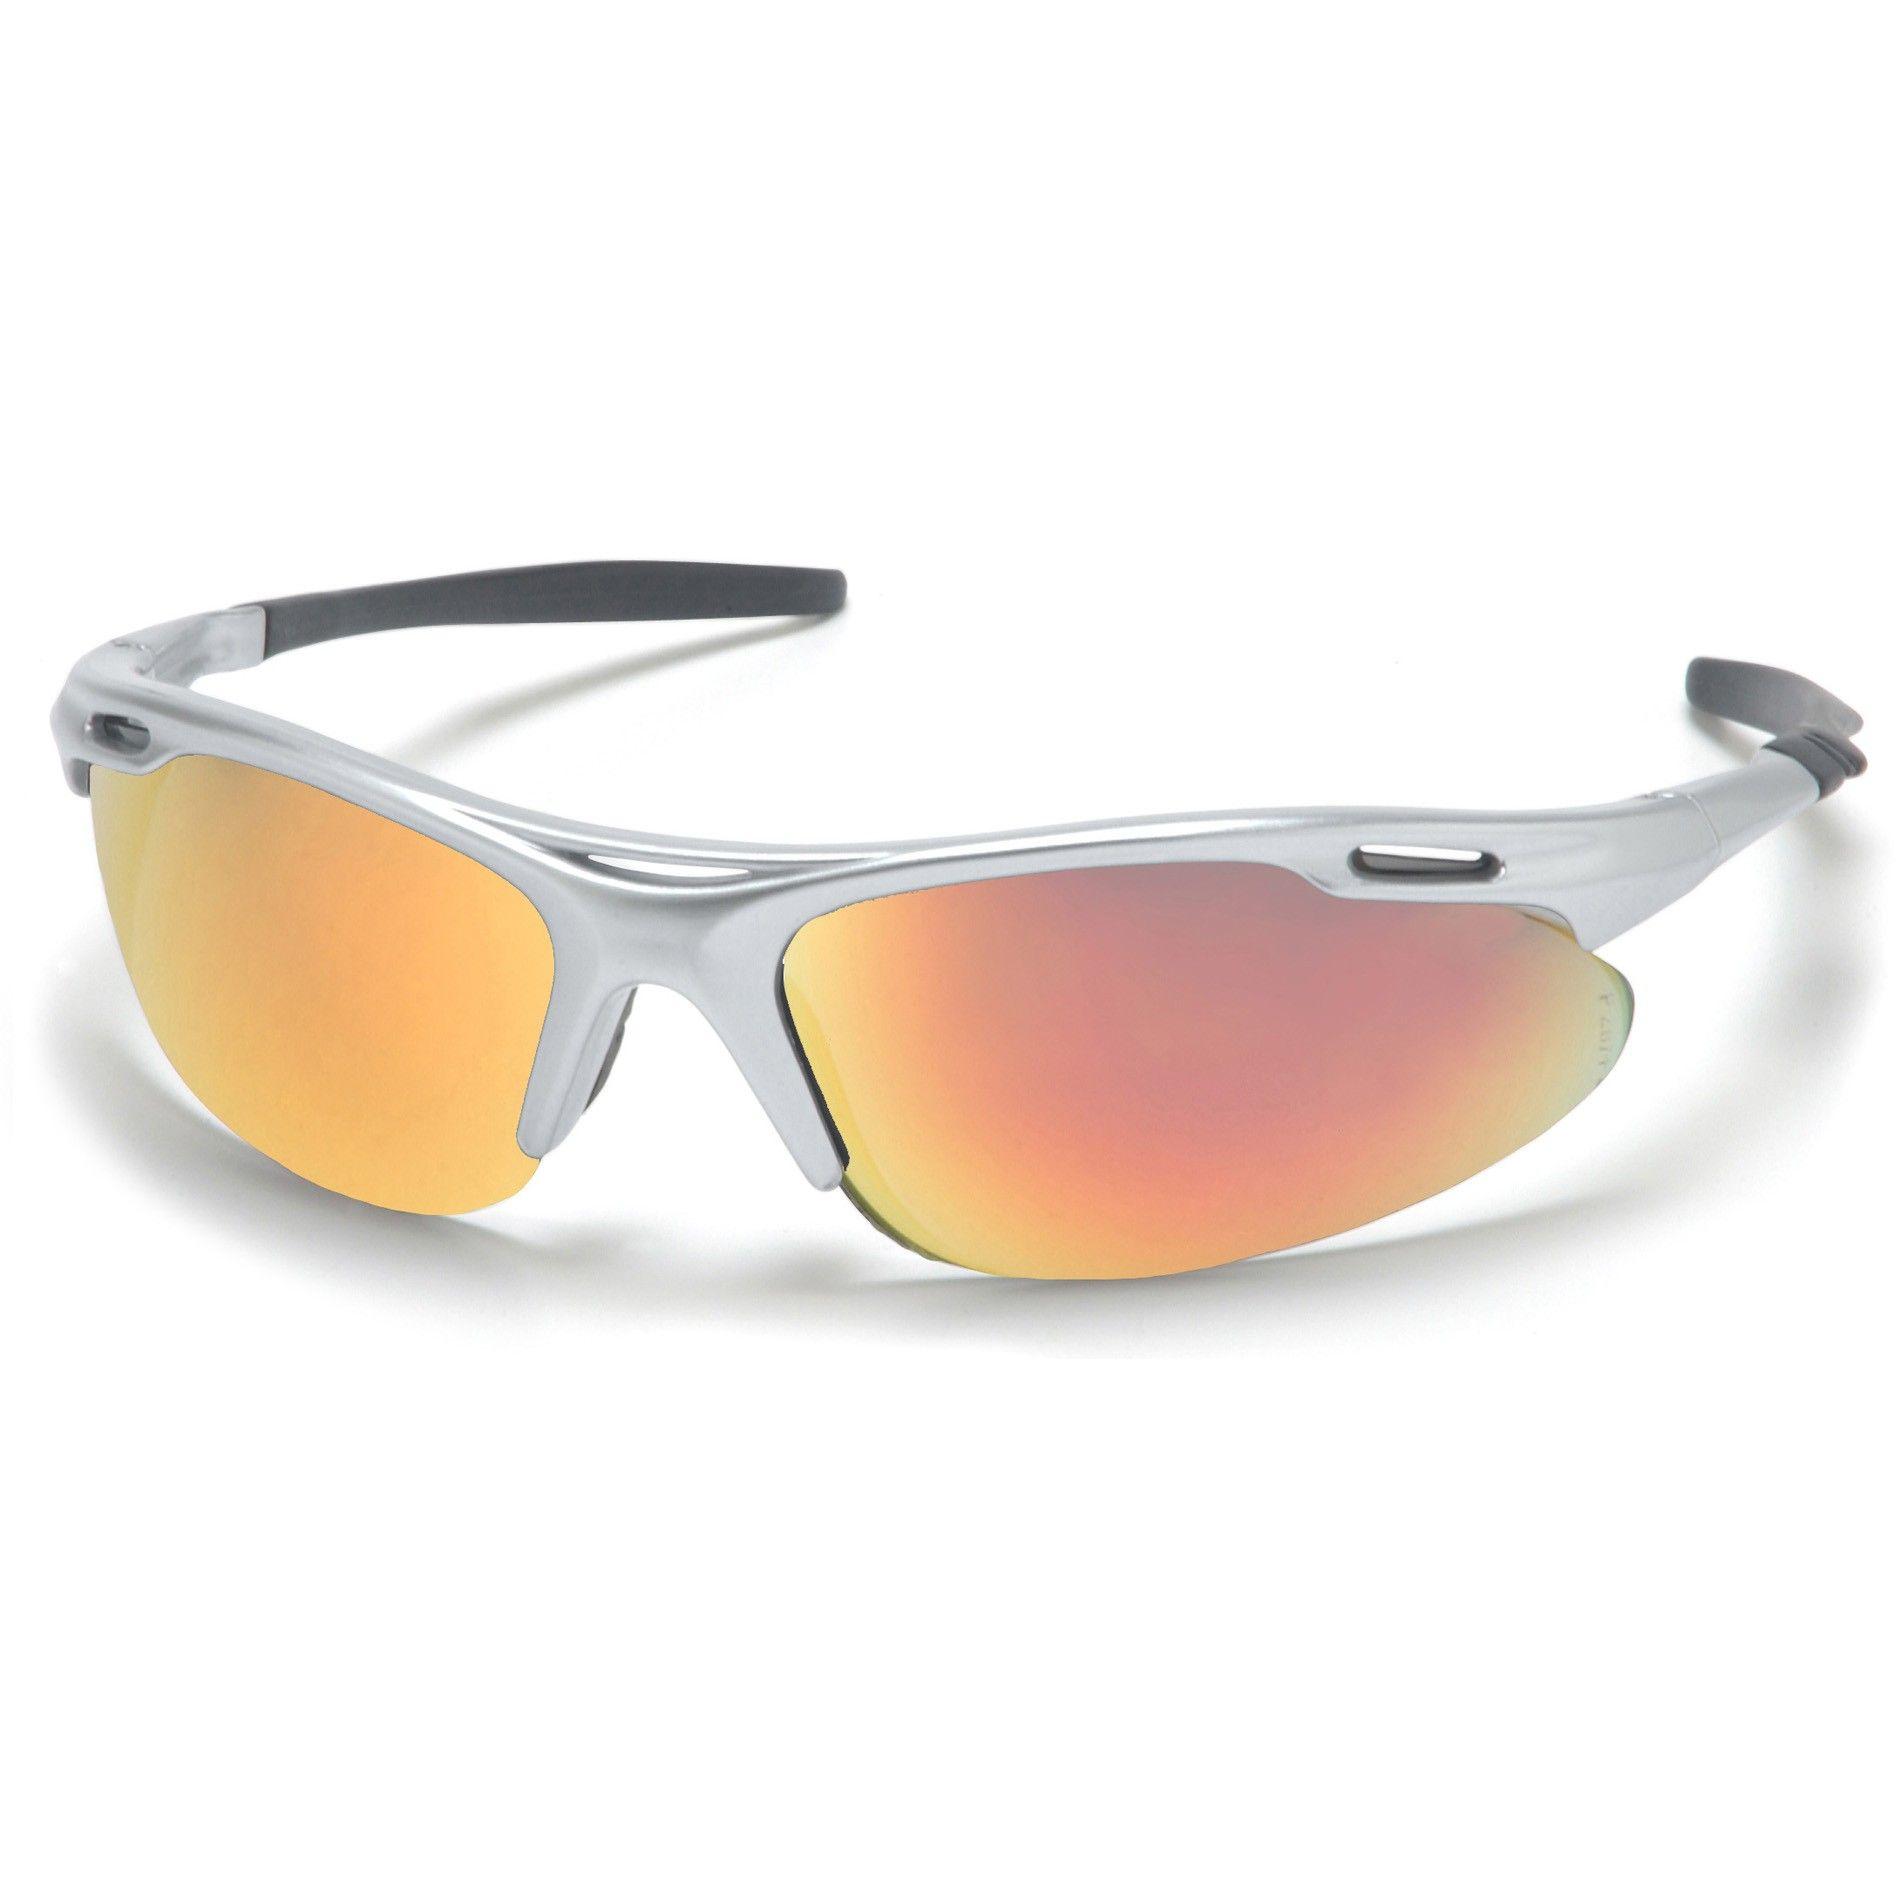 Sleek silver wrap around safety glasses from Safetygirl